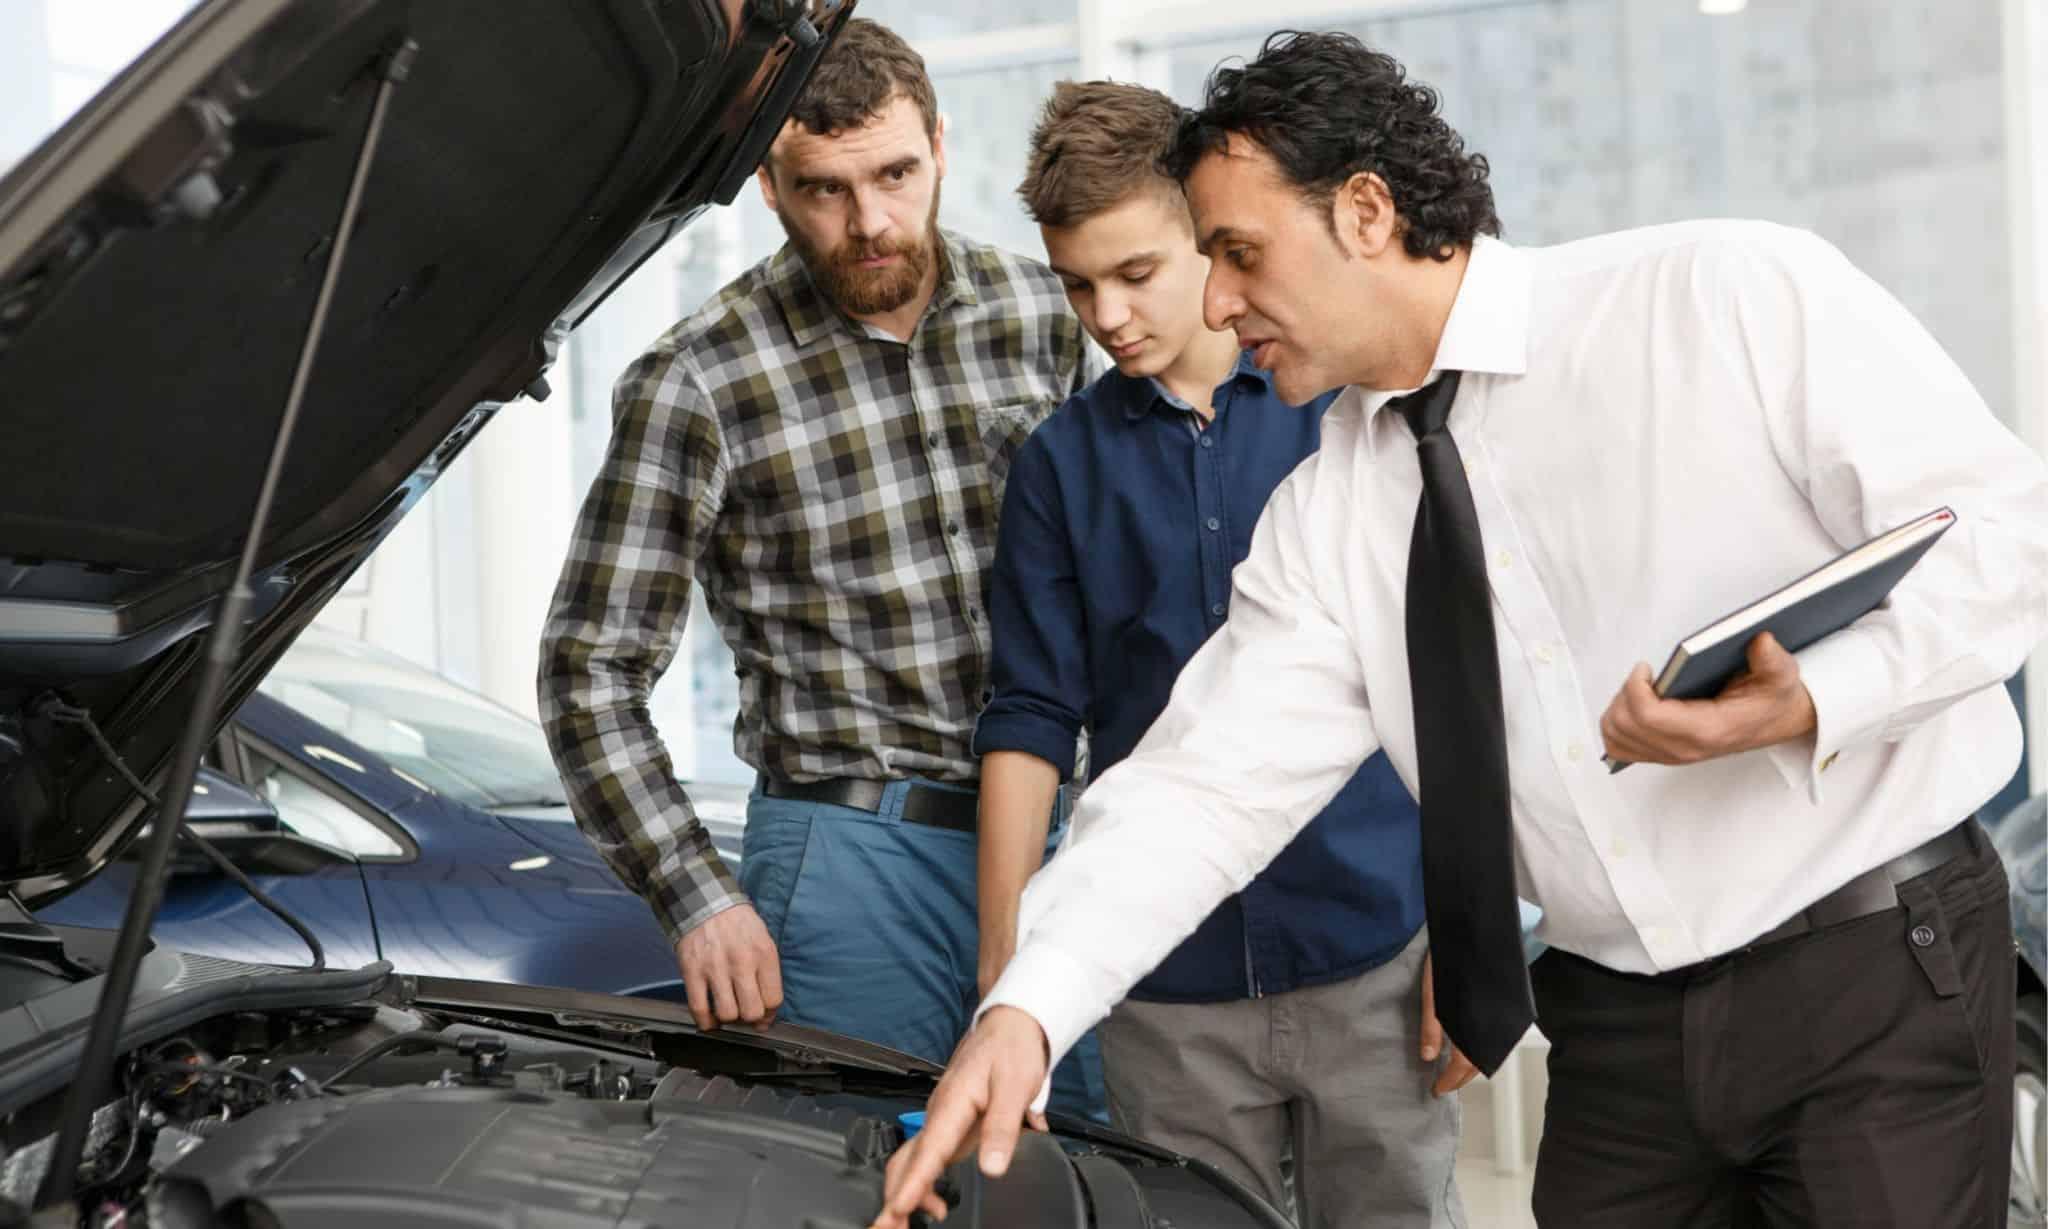 automotive customer experience